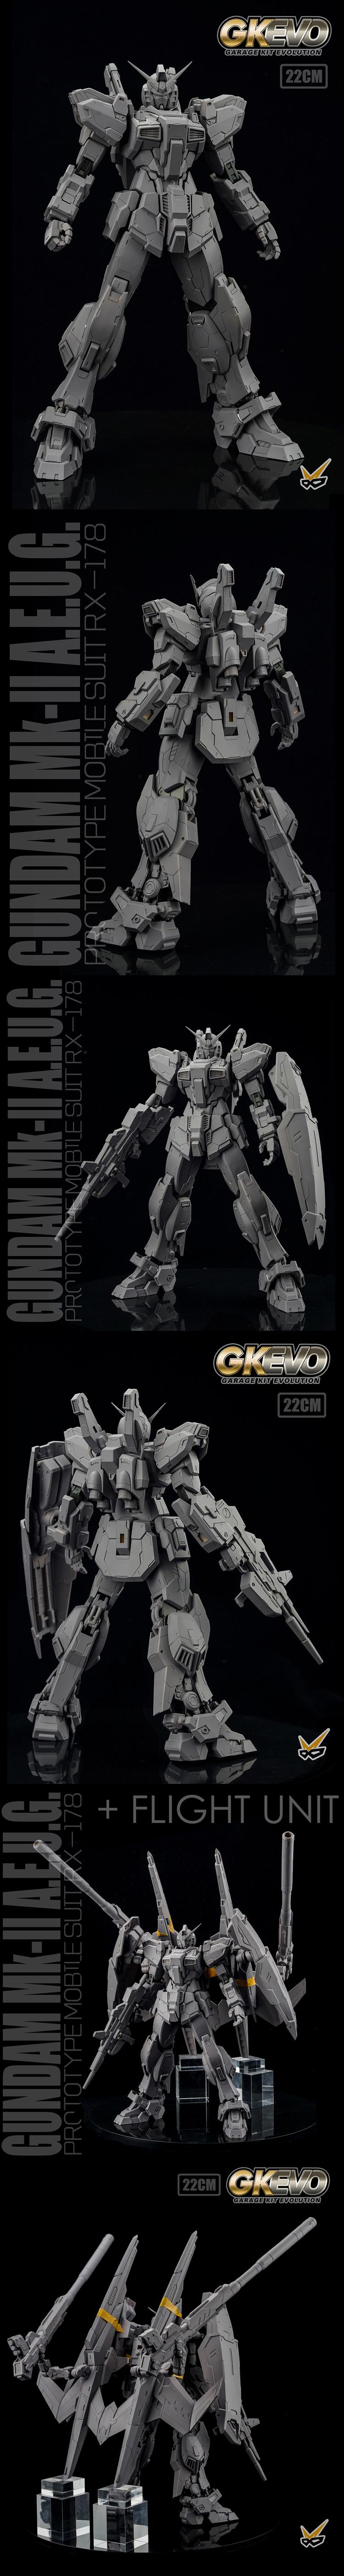 S503_magami_gears_op01_info_006.jpg